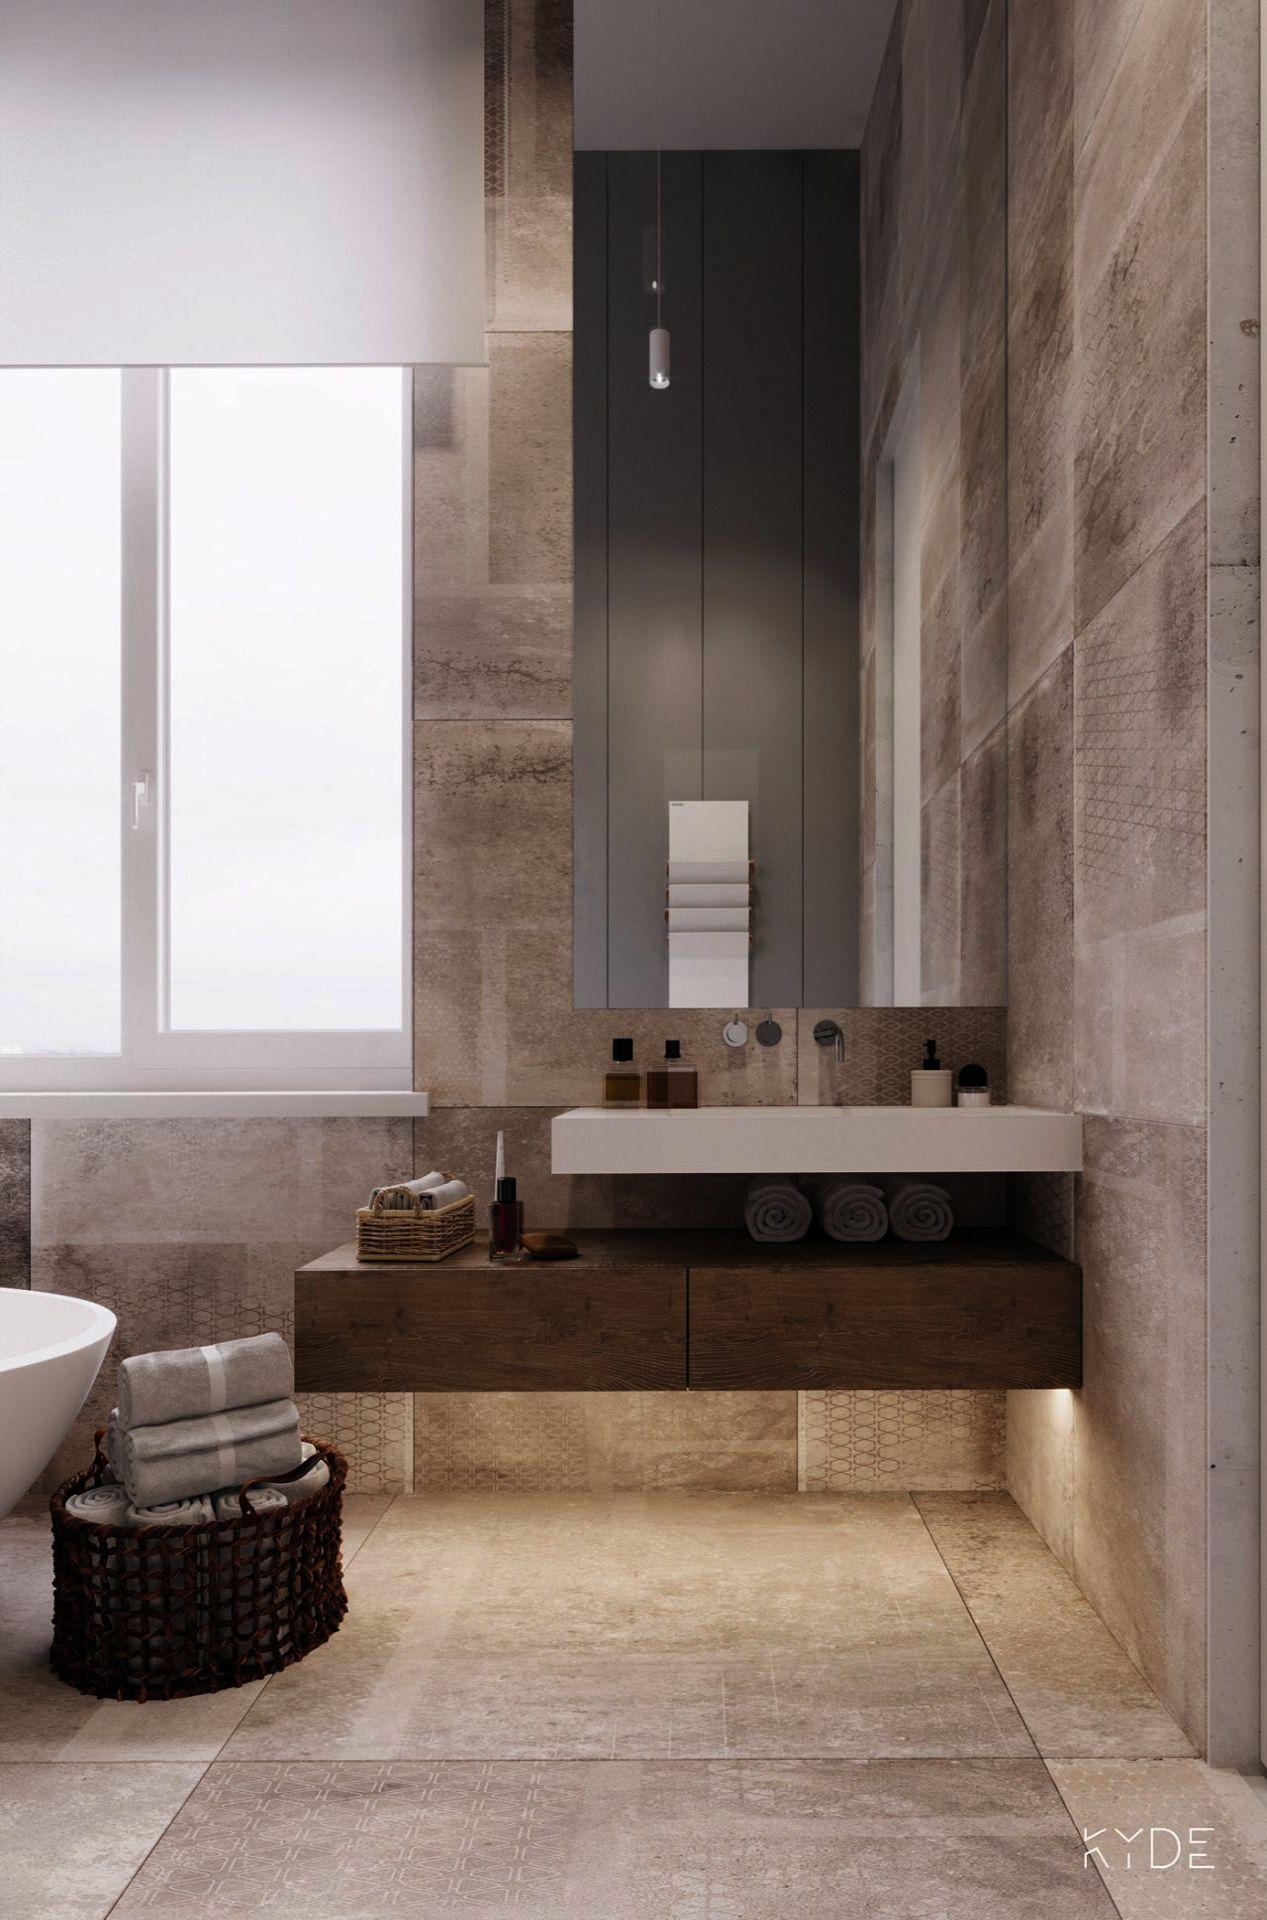 Elegant Bathroom Themes Luxury Bathrooms Small Spaces Modern